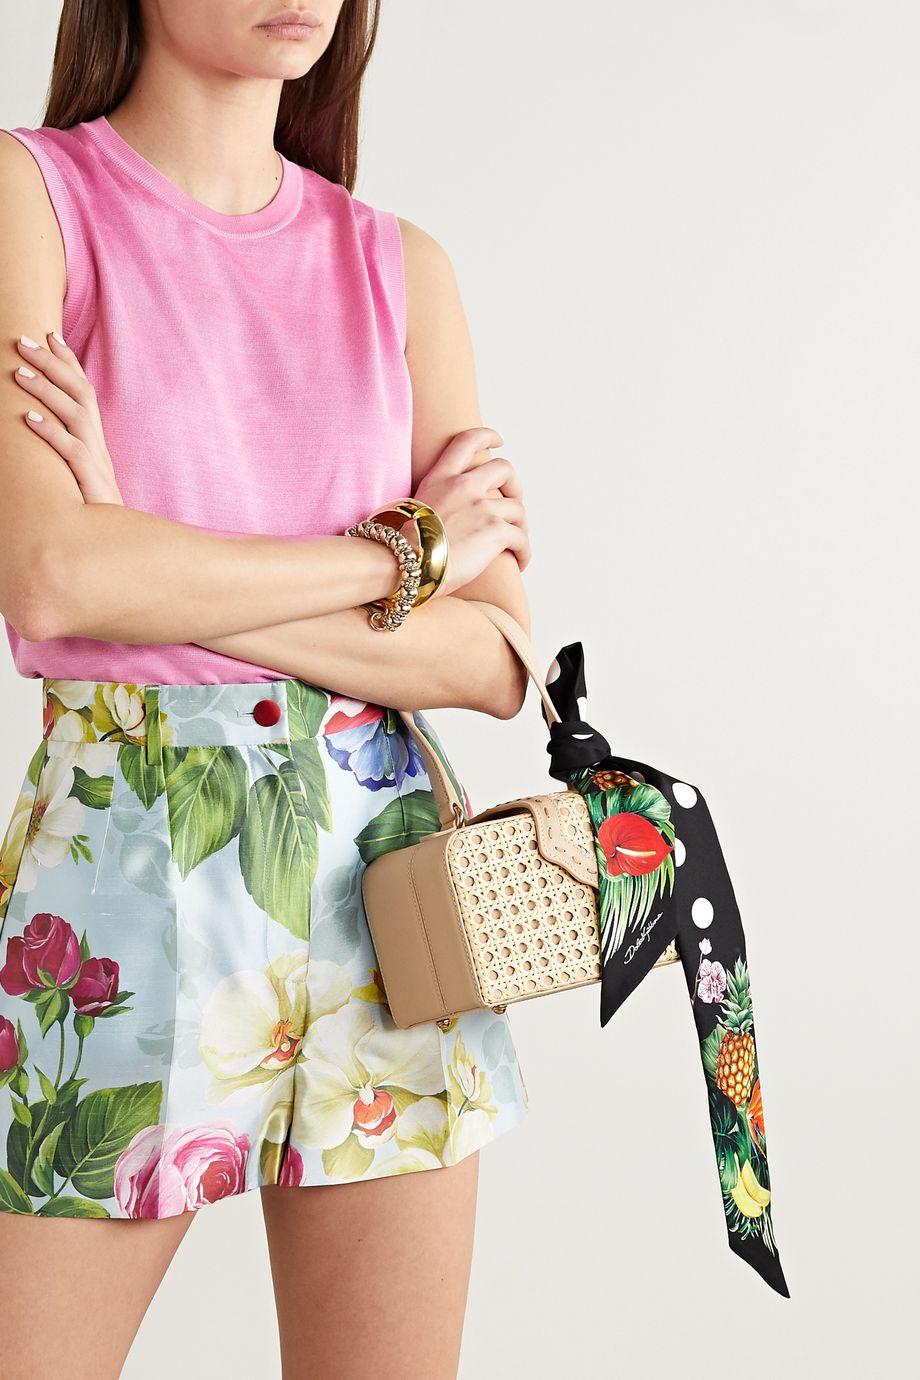 Dolce & Gabbana Foulard en serge de soie imprimée